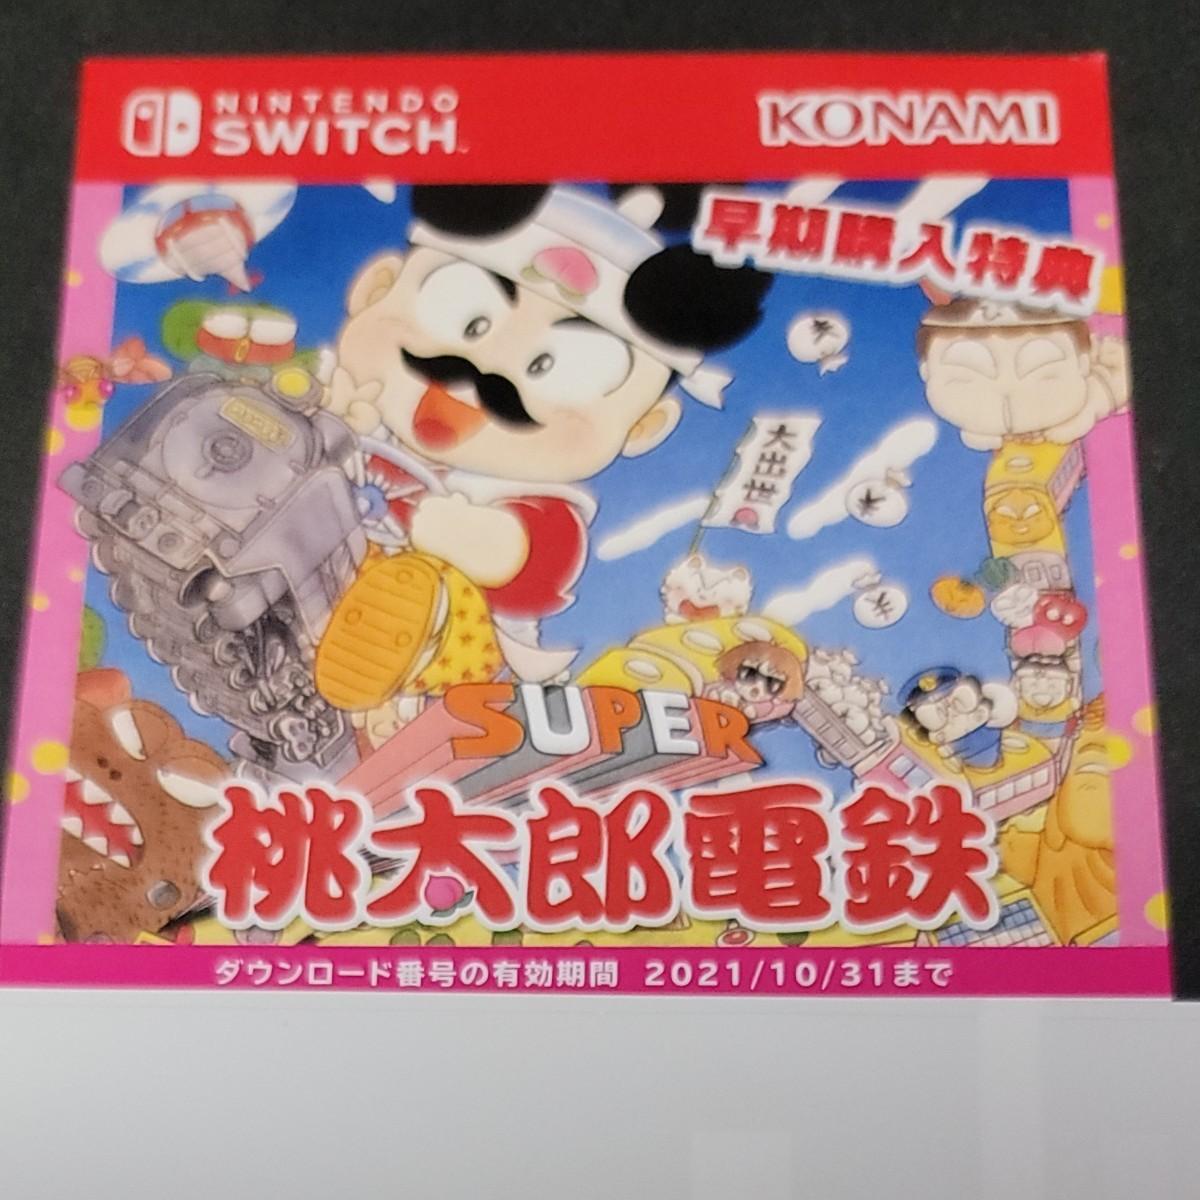 桃太郎電鉄 ファミコン版桃鉄 早期購入特典 switch